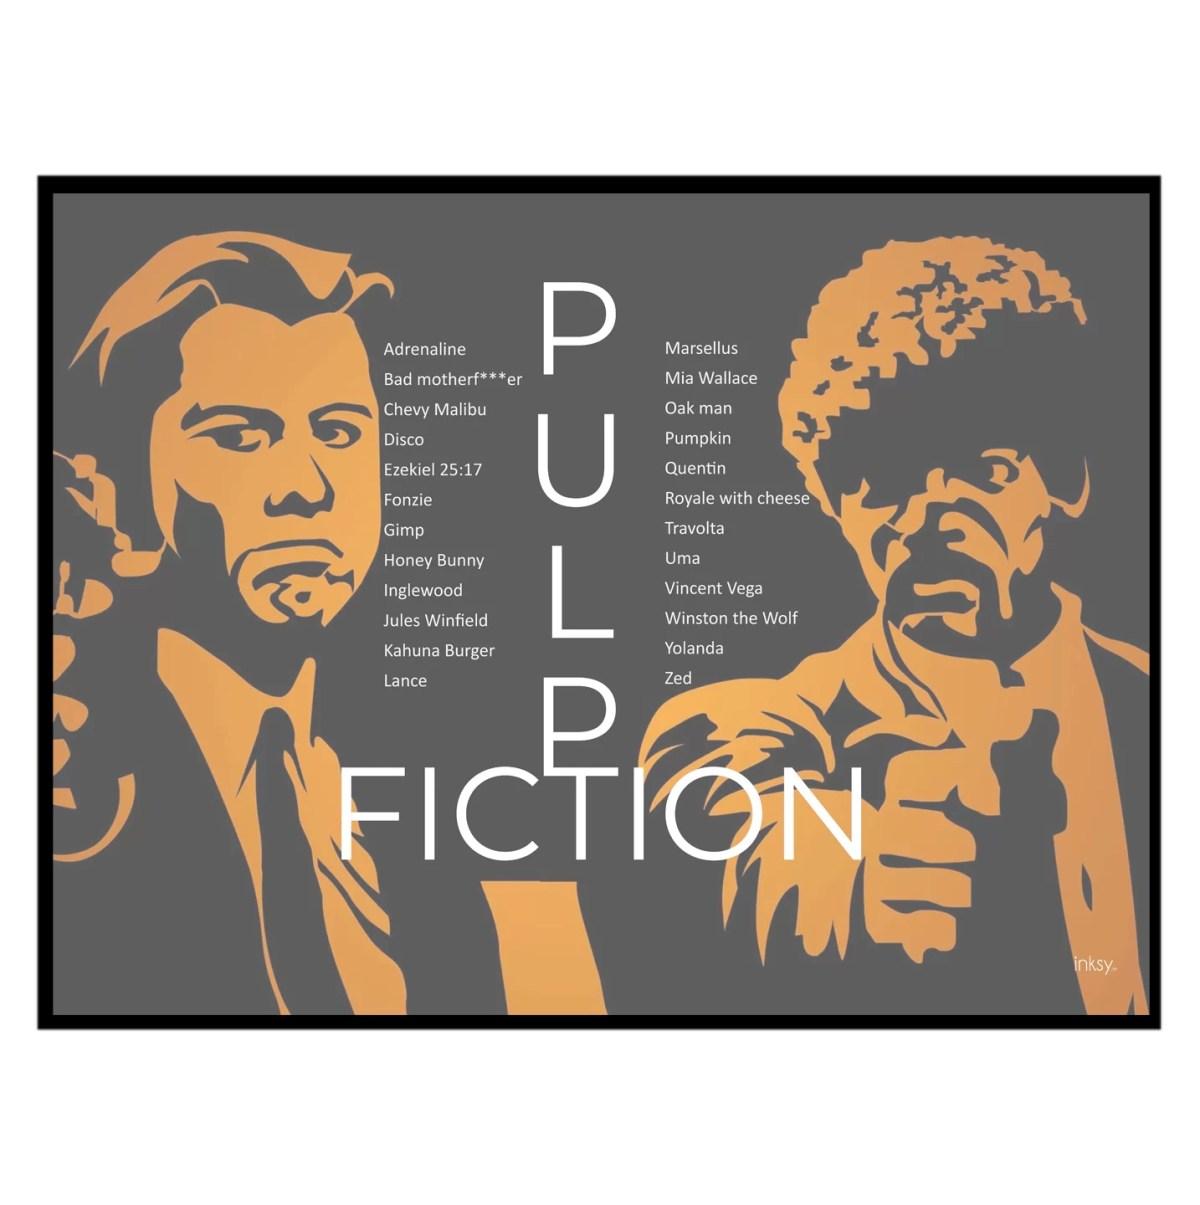 Pulp Fiction tavla poster